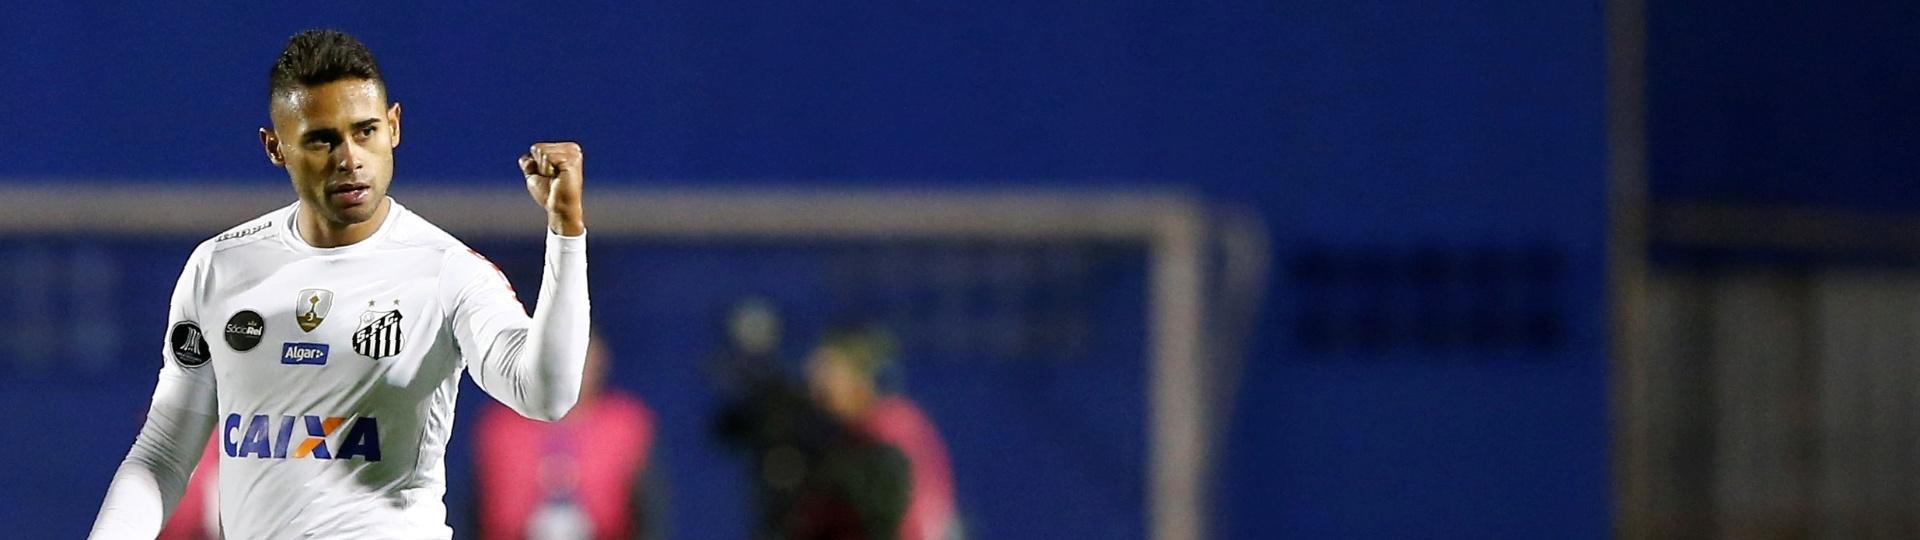 Kayke empatou para o Santos na Vila Capanema